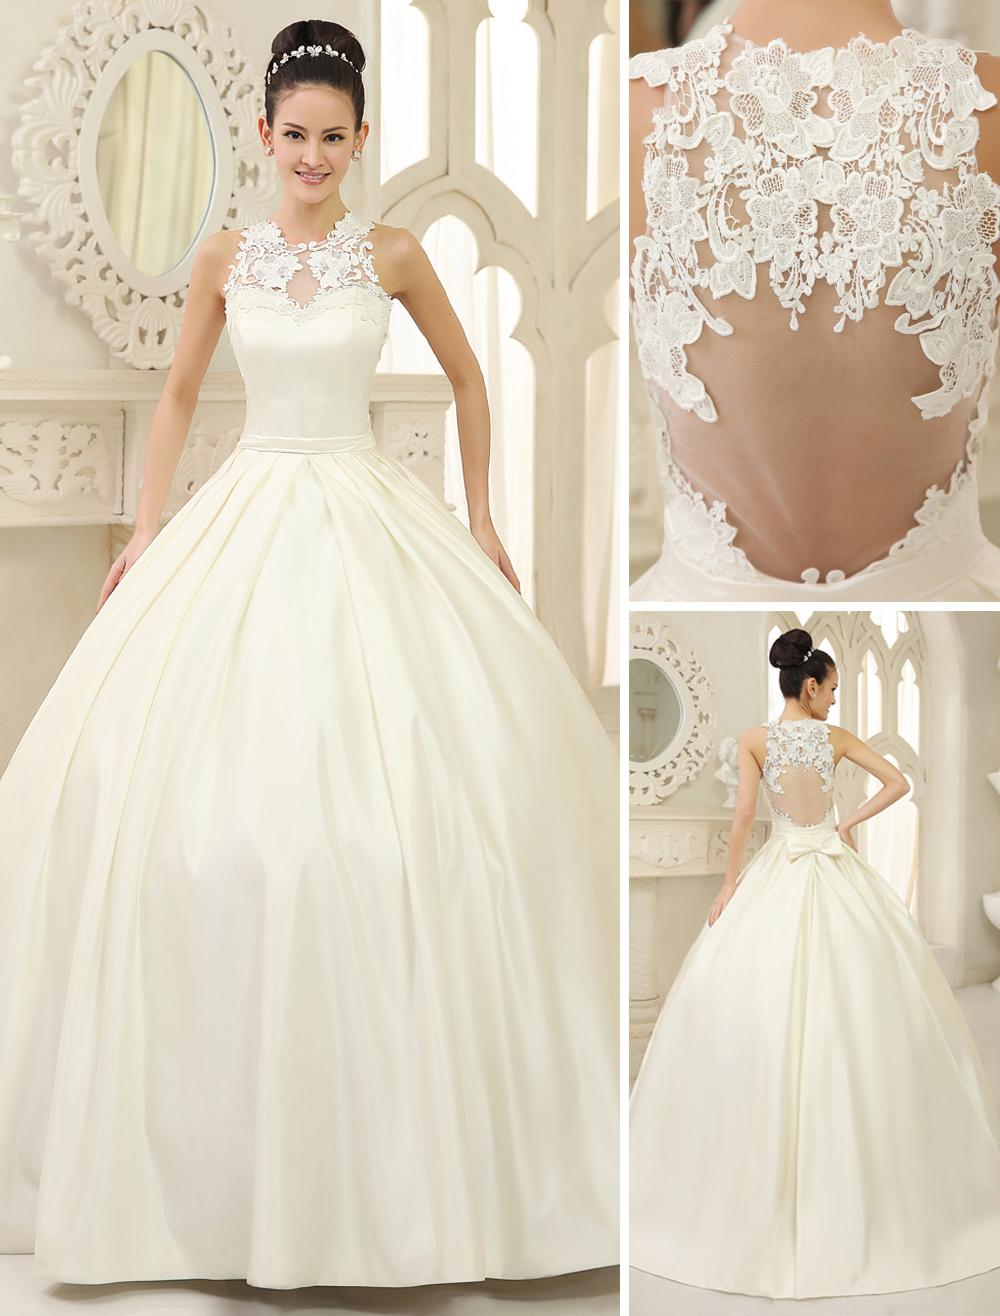 Vestidos de novia de satin